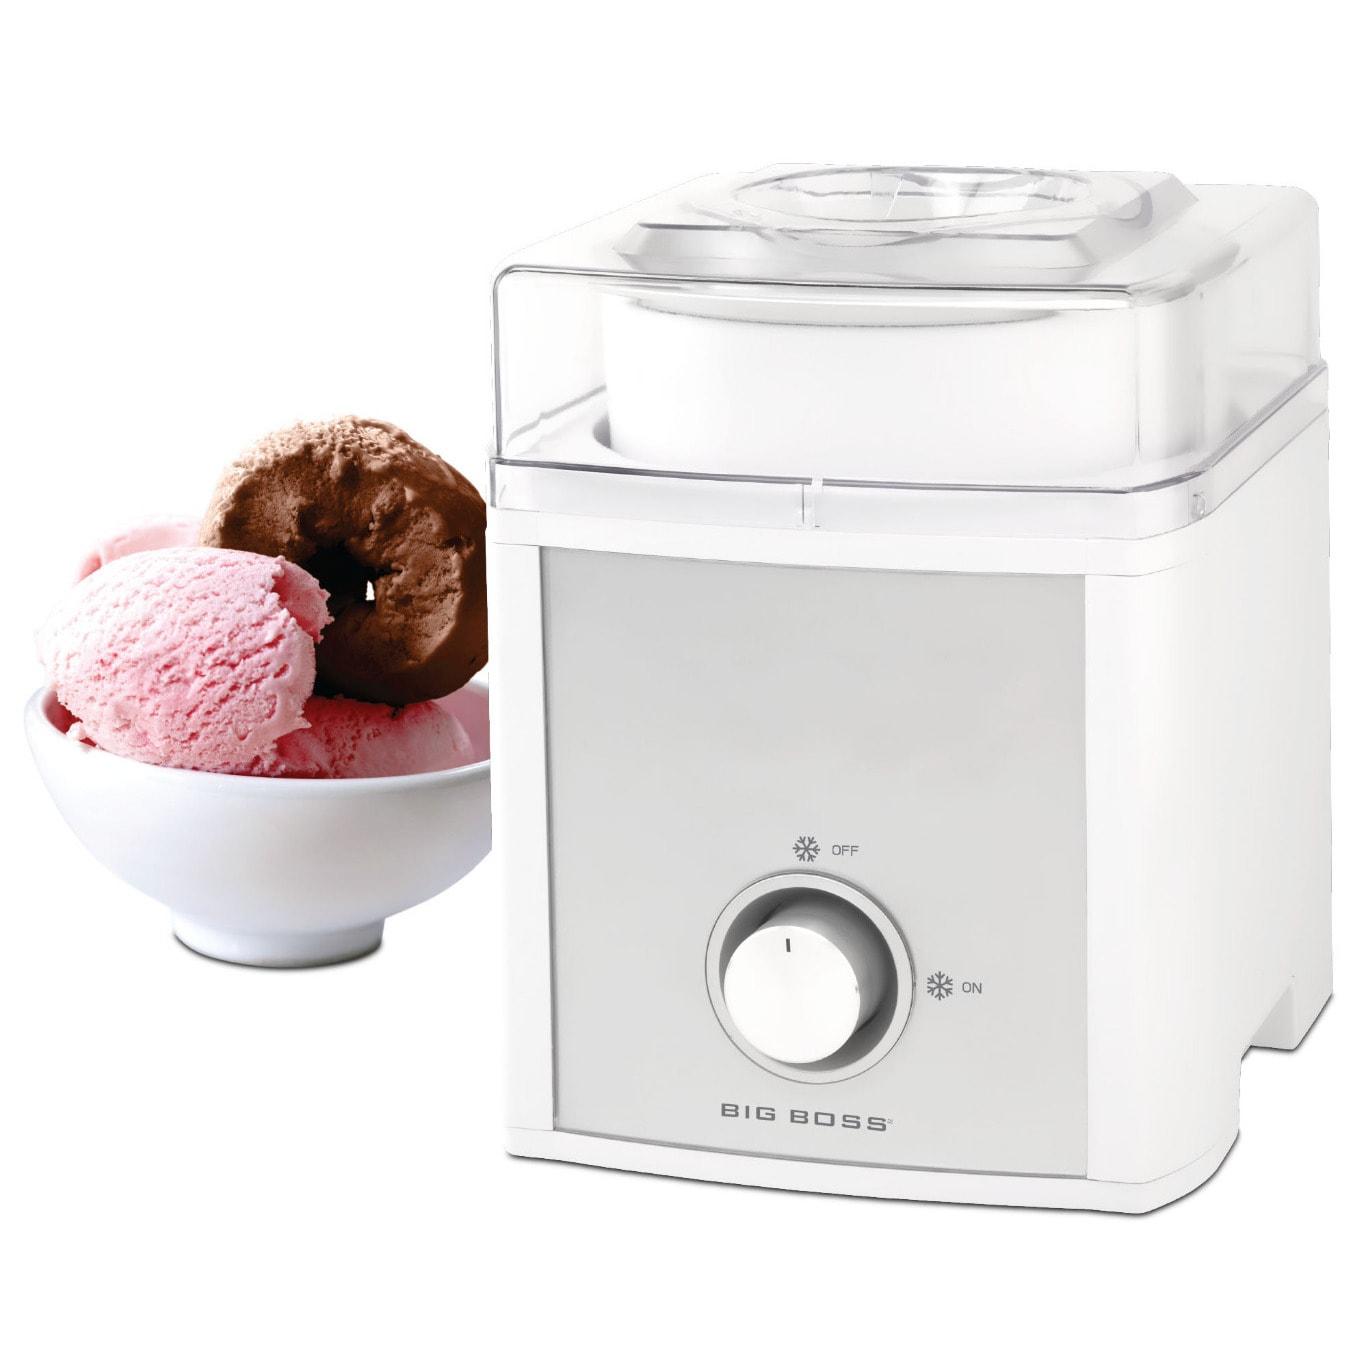 Big Boss 2-quart Ice Cream Maker (White), Silver (Aluminum)